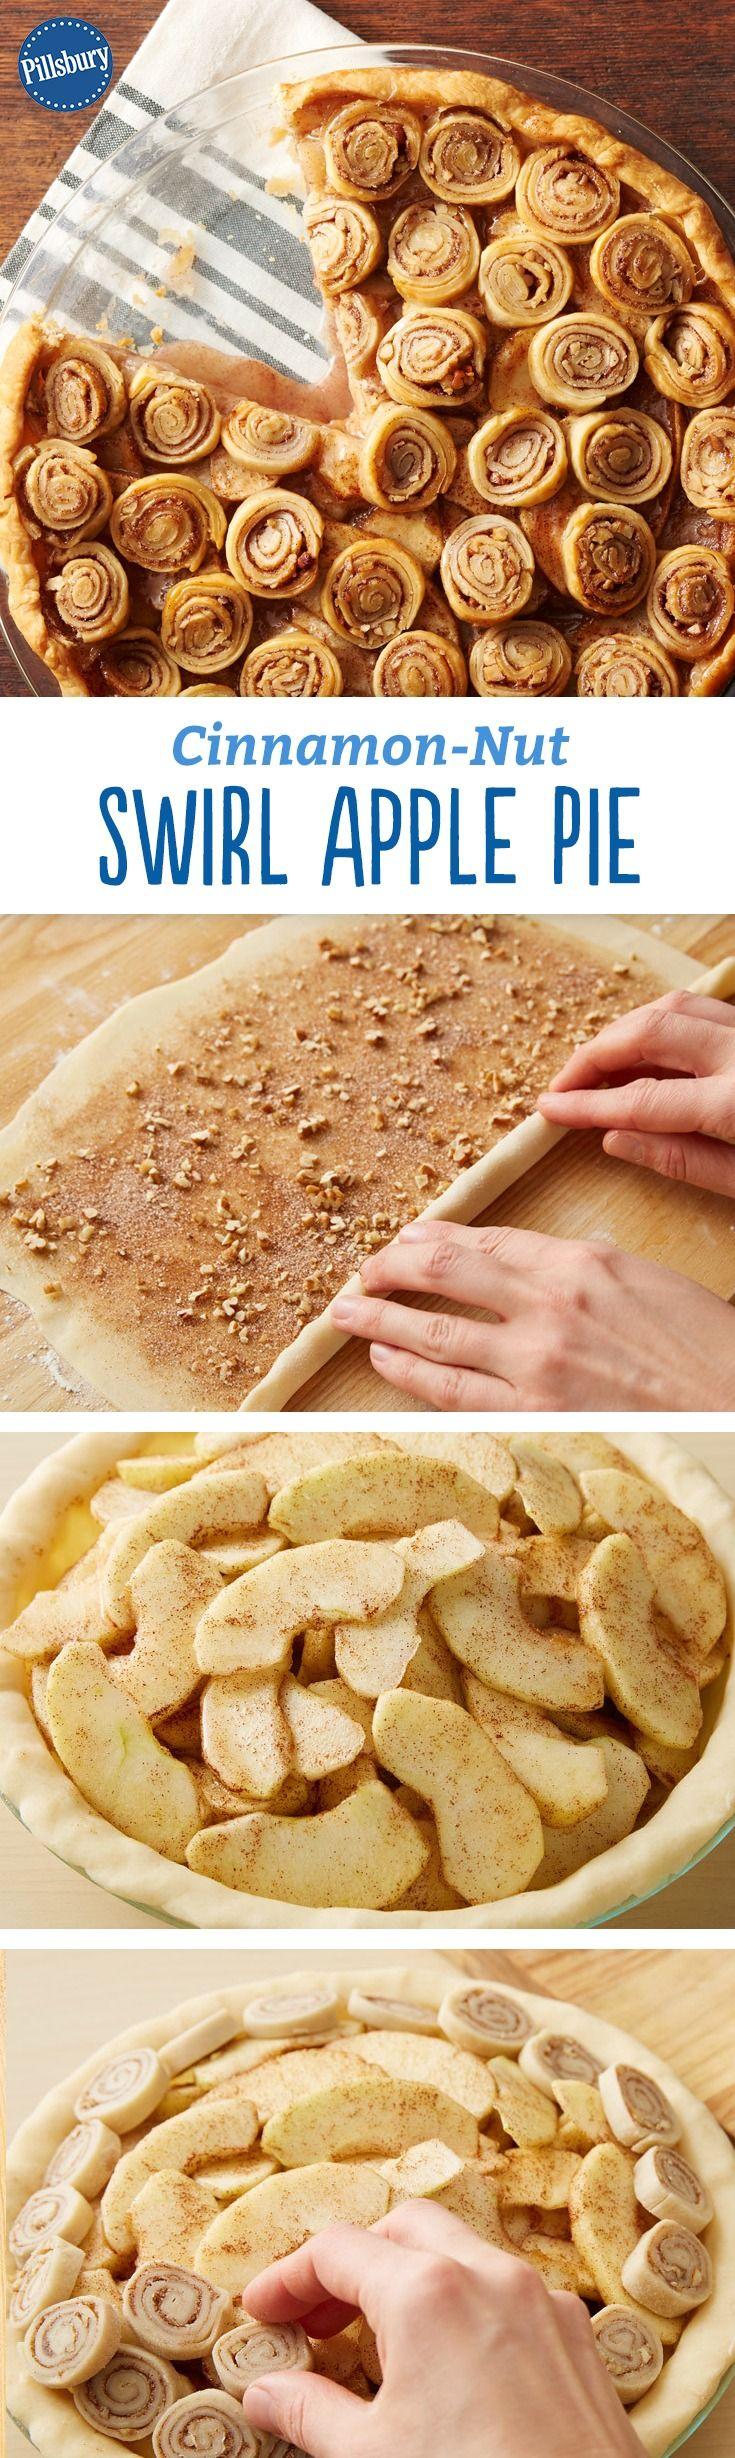 Cinnamon-Nut Swirl Apple Pie Recipe - No lattice? No problem. The swirls of cinnamon, sugar and pecans make this a fun and festive alternative to a classic apple pie.